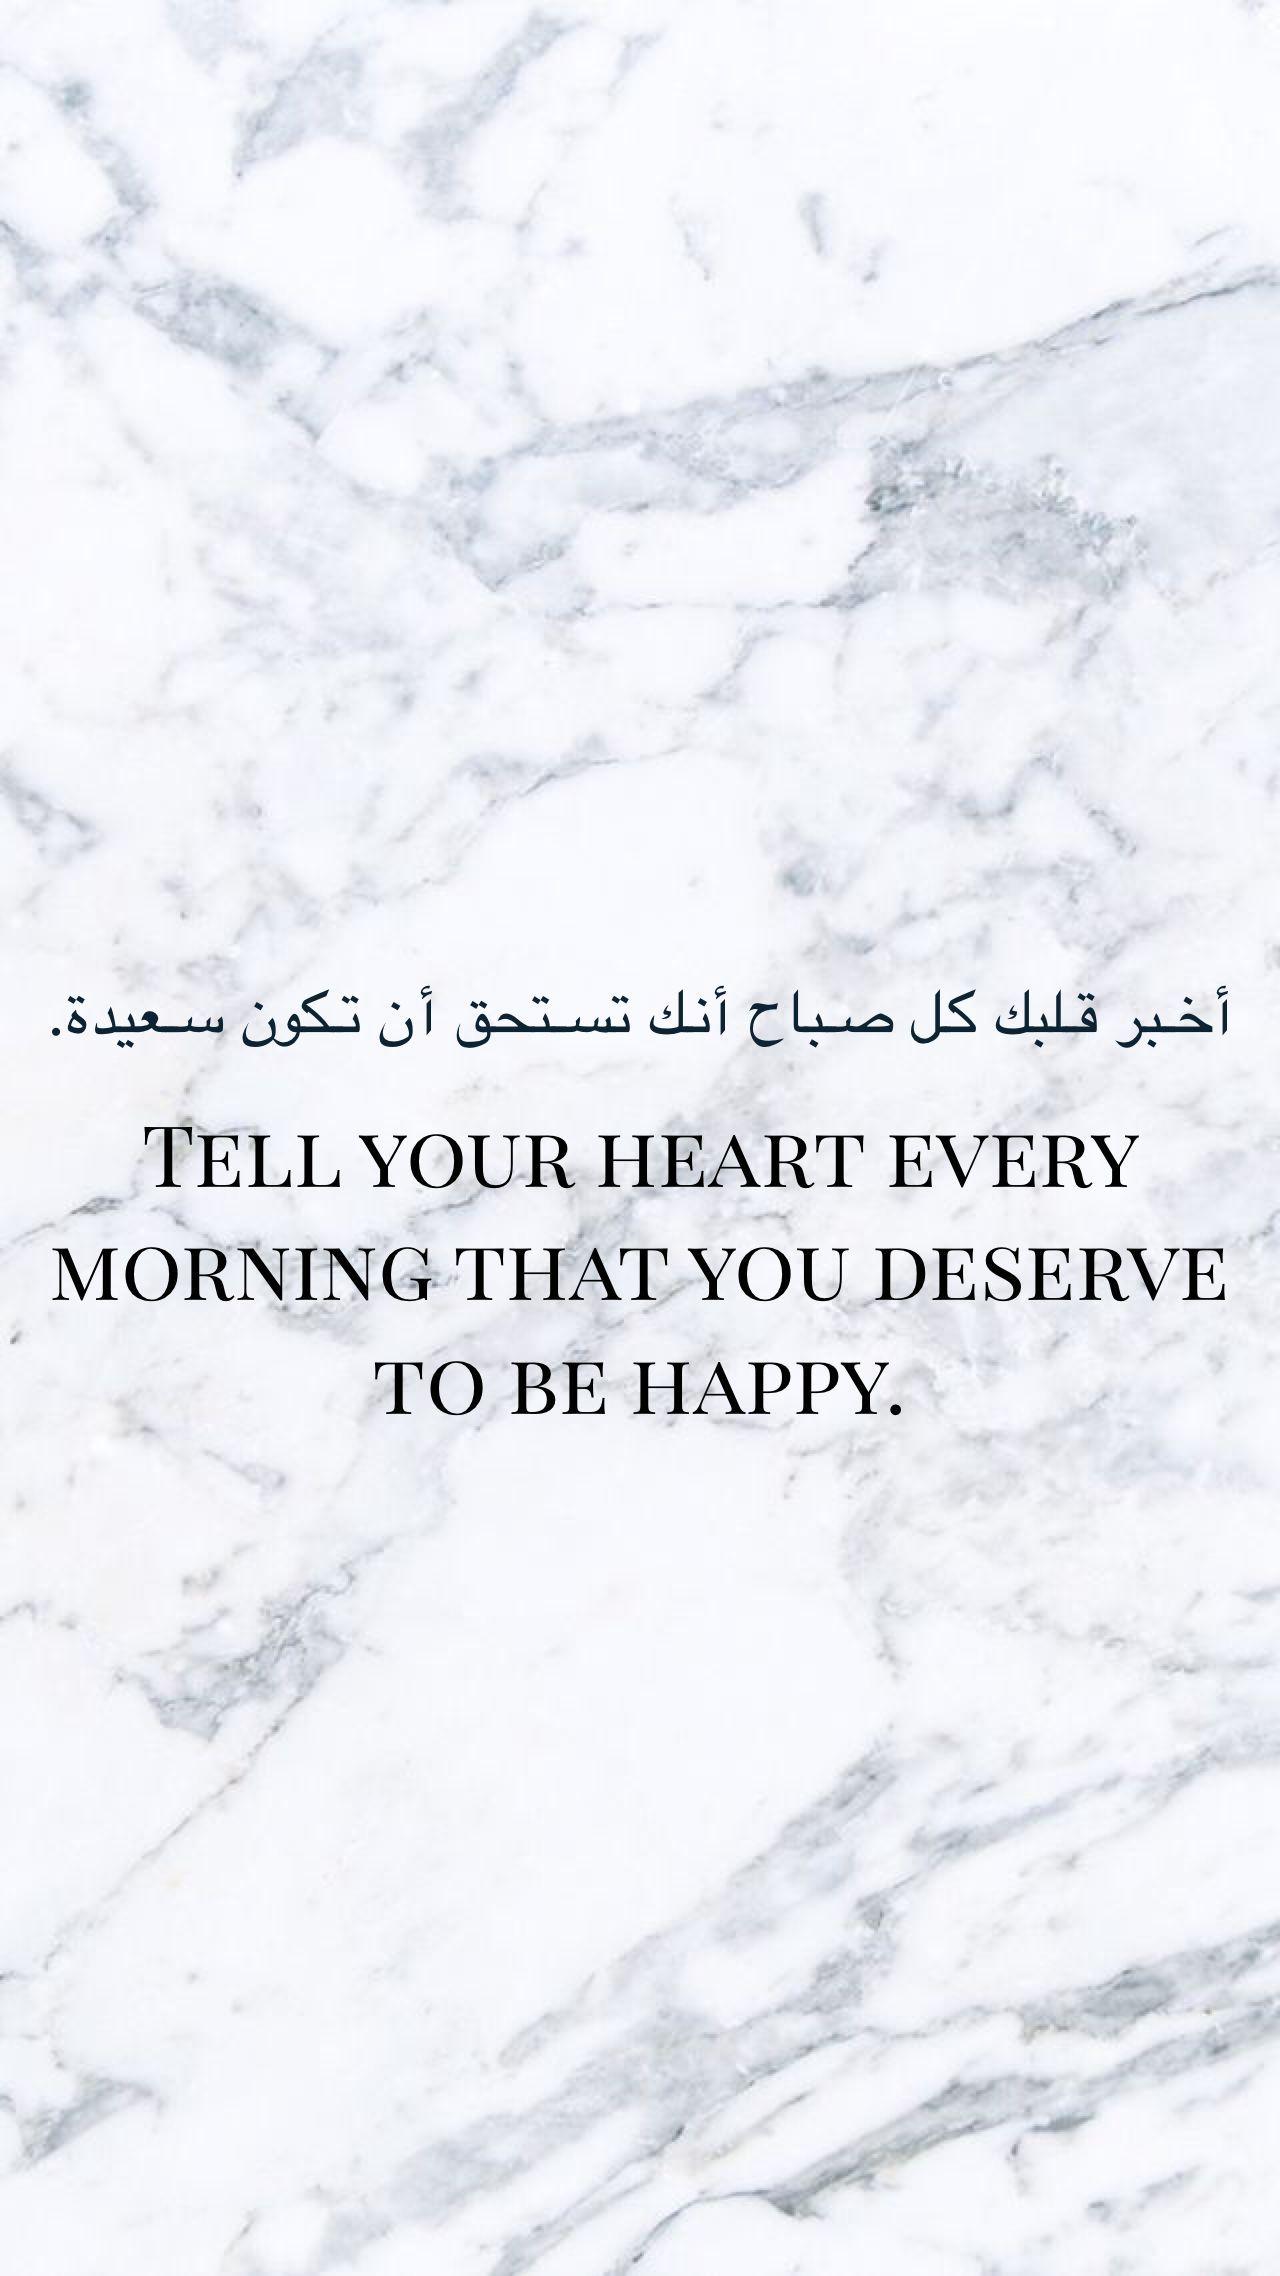 Iphone Wallpaper Motivational Quotes Lockscreen Ipcwallpapers Seni Islamis